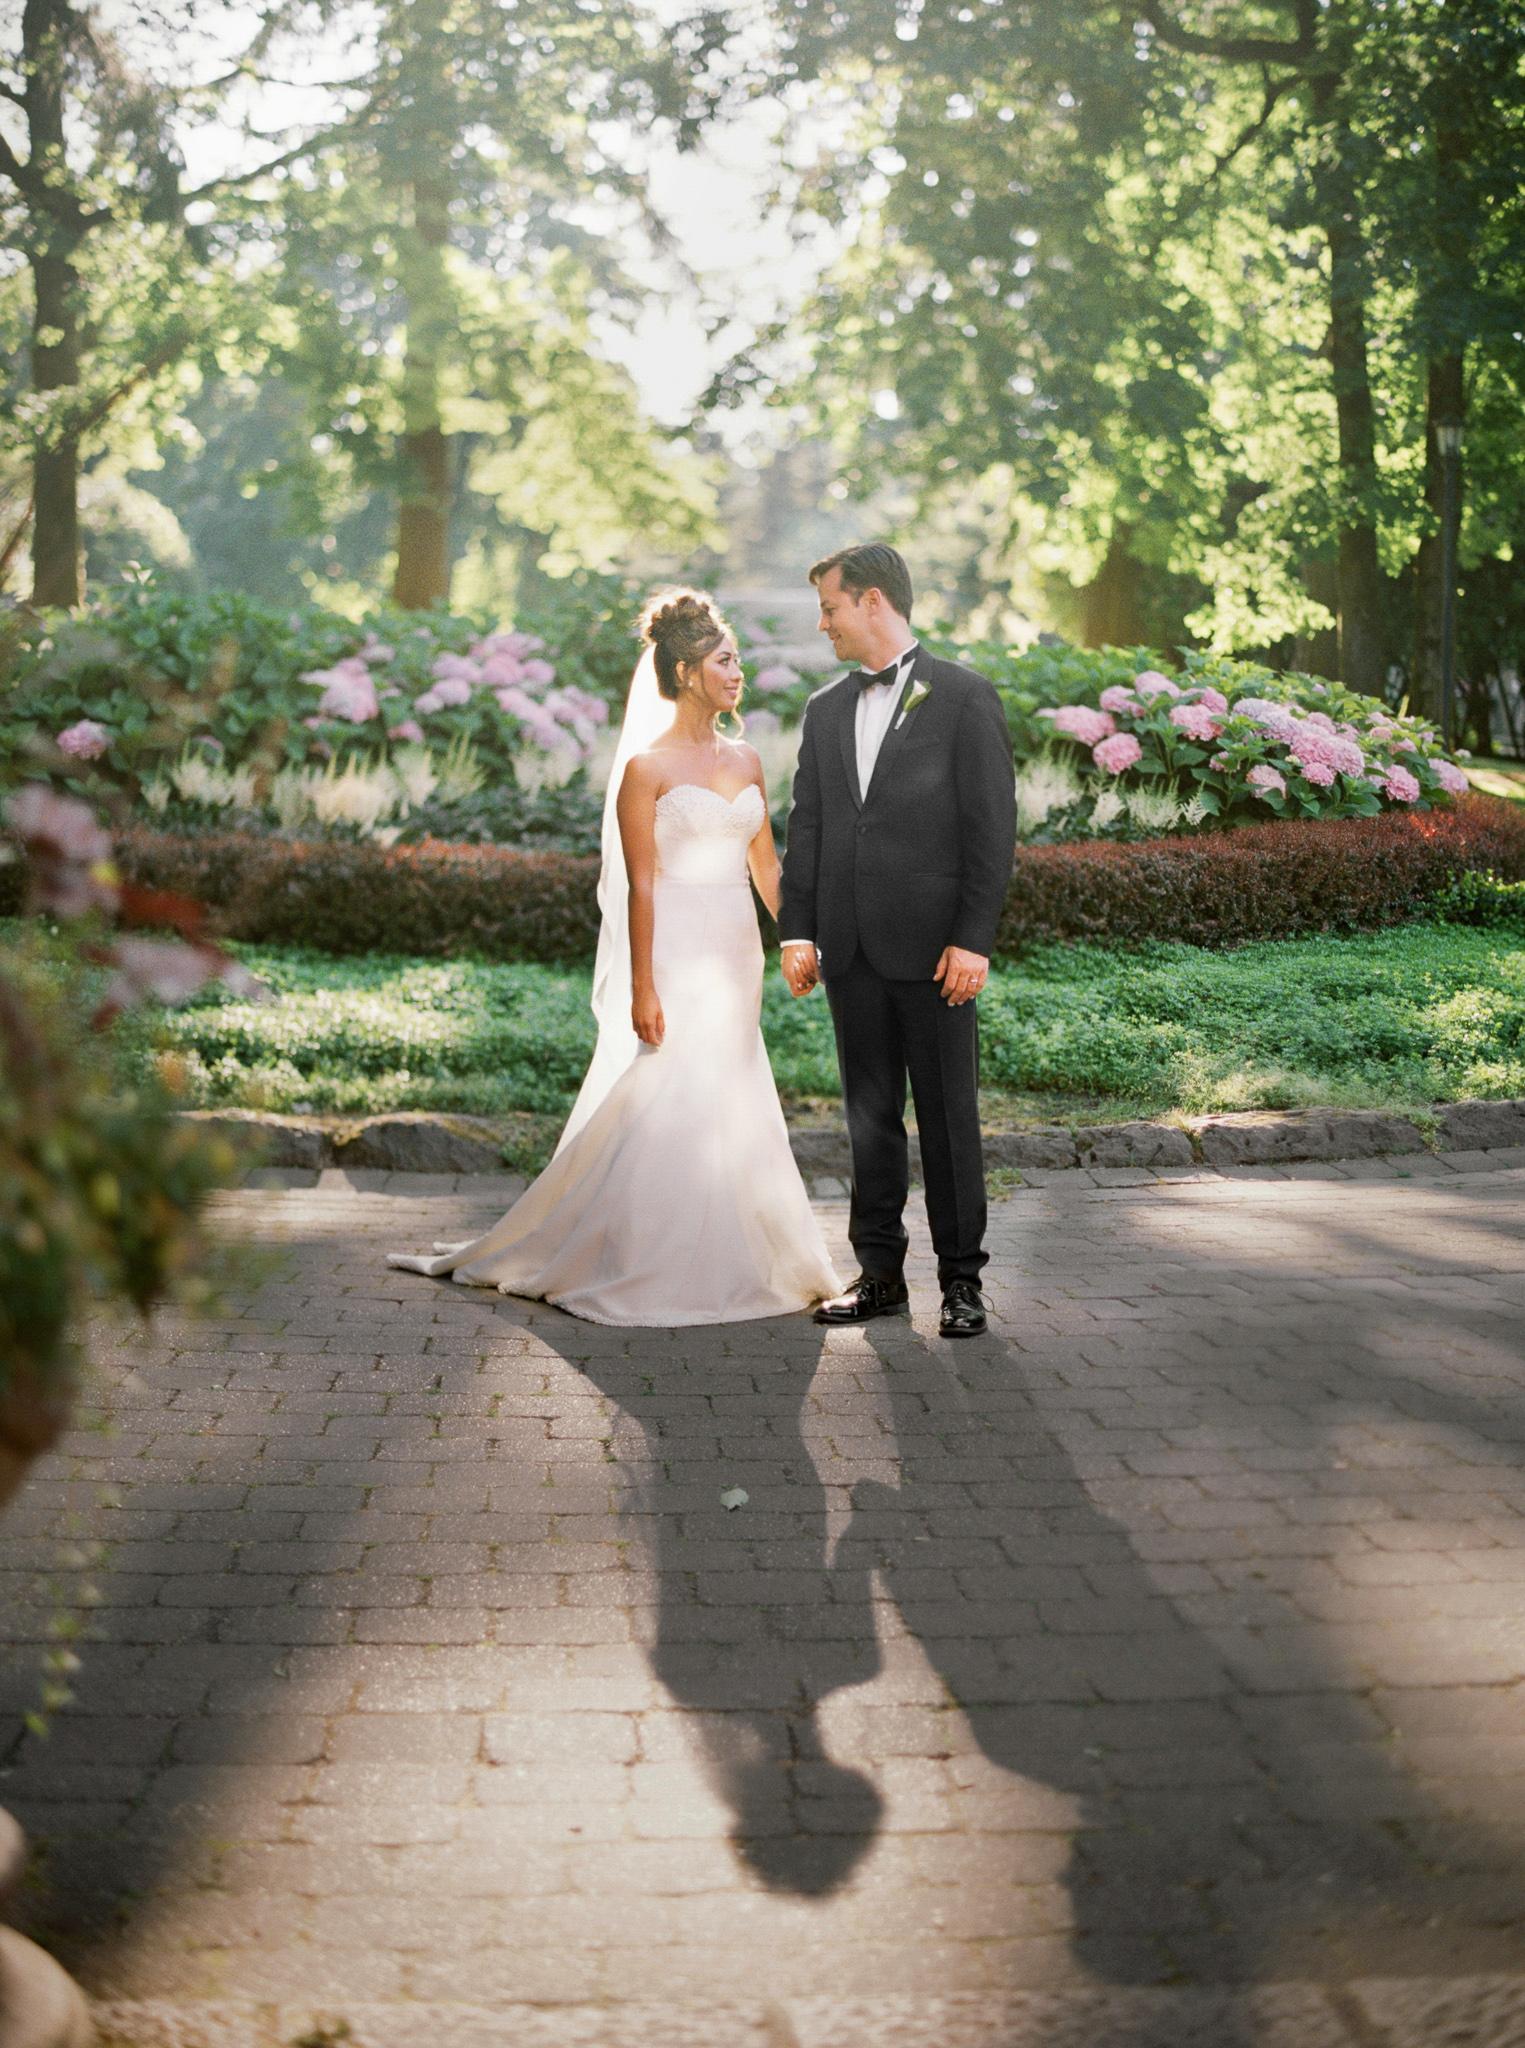 091OutliveCreative_Travel_Photographer_Videographer_Lewis&Clark_Oregon_Elegant_BlackTie_Destination_Wedding.jpg